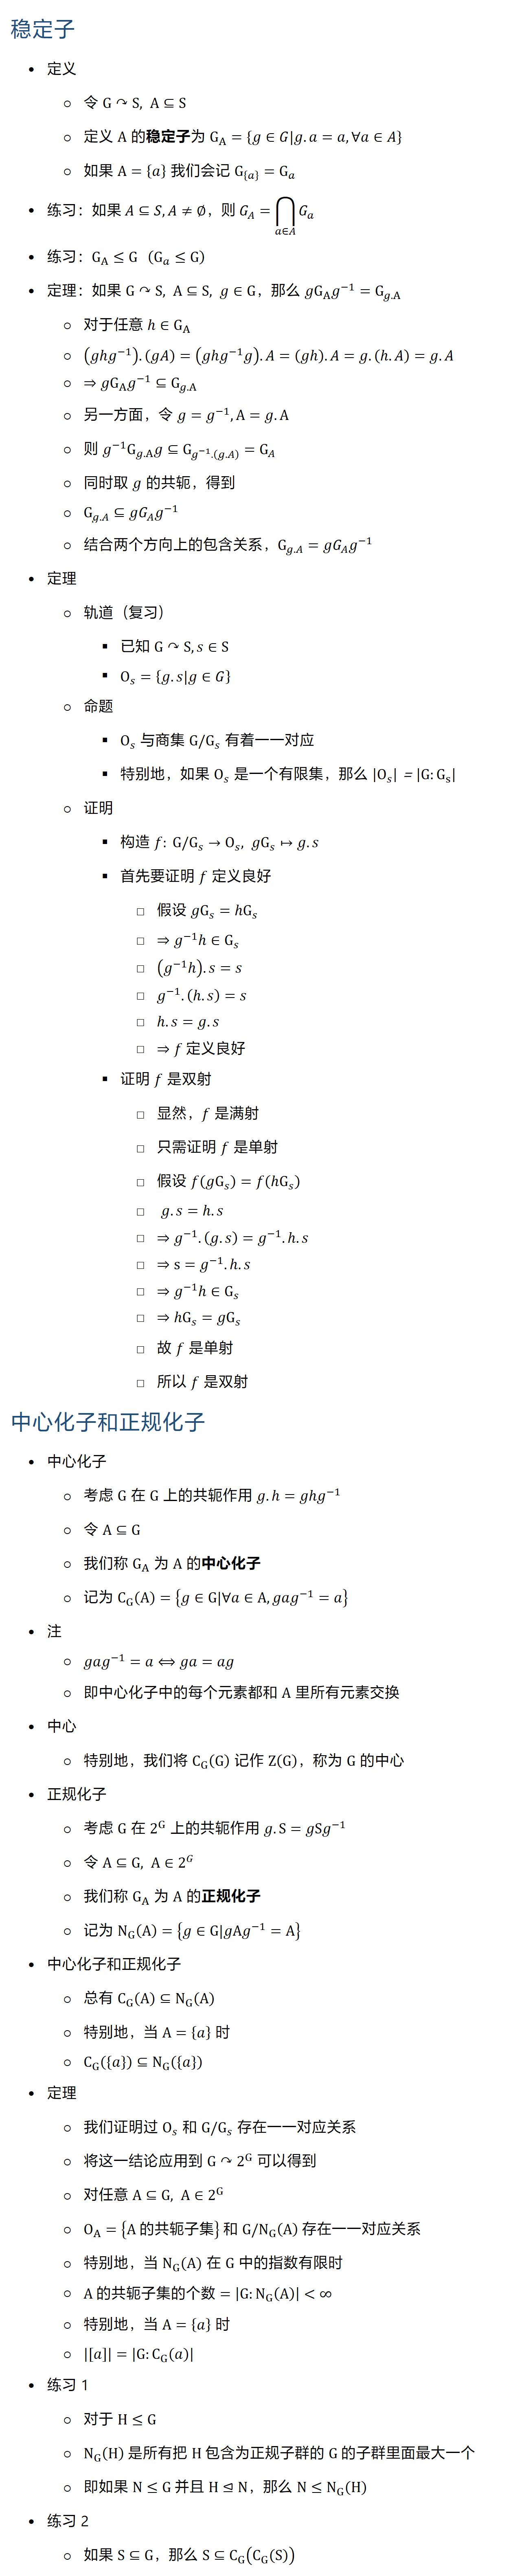 稳定子 • 定义 ○ 令 G↷S, A⊆S ○ 定义 A 的稳定子为 G_A={g∈G|g.a=a, ∀a∈A} ○ 如果 A={a} 我们会记 G_{a} =G_a • 练习 • 练习:G_A≤G (G_a≤G) • 定理:如果 G↷S, A⊆S, g∈G,那么 〖gG〗_A g^(−1)=G_(g.A) ○ 对于任意 h∈G_A ○ (gh�^(−1) ).(gA)=(gh�^(−1) g).A=(gh.A=g.(hA)=g.A ○ ⇒〖gG〗_A g^(−1)⊆G_(g.A) ○ 另一方面,令 g=g^(−1), A=g.A ○ 则 〖g^(−1) G〗_(g.A) g⊆G_(g^(−1).(g.A) )=G_A ○ 同时取 g 的共轭,得到 ○ G_(g.A)⊆gG_A g^(−1) ○ 结合两个方向上的包含关系,G_(g.A)=gG_A g^(−1) • 定理 ○ 轨道(复习) § 已知 G↷S, s∈S § O_s={g.s|g∈G} ○ 命题 § O_s 与商集 G\/G_s 有着一一对应 § 特别地,如果 O_s 是一个有限集,那么 |O_s |=|G:G_s | ○ 证明 § 构造 f: G\/G_s→O_s, 〖gG〗_s↦g.s § 首先要证明 f 定义良好 □ 假设 〖gG〗_s=〖h〗_s □ ⇒g^(−1) h∈G_s □ (g^(−1) h.s=s □ g^(−1).(hs)=s □ h.s=g.s □ ⇒f 定义良好 § 证明 f 是双射 □ 显然,f 是满射 □ 只需证明 f 是单射 □ 假设 f(gG_s )=f(h_s ) □ g.s=h.s □ ⇒g^(−1).(g.s)=g^(−1).h.s □ ⇒s=g^(−1).h.s □ ⇒g^(−1) h∈G_s □ ⇒〖h〗_s=〖gG〗_s □ 故 f 是单射 □ 所以 f 是双射 中心化子和正规化子 • 中心化子 ○ 考虑 G 在 G 上的共轭作用 g.h=〖gh�〗^(−1) ○ 令 A⊆G ○ 我们称 G_A 为 A 的中心化子 ○ 记为 C_G (A)={g∈G|∀a∈A, gag^(−1)=a} • 注 ○ gag^(−1)=a⟺ga=ag ○ 即中心化子中的每个元素都和 A 里所有元素交换 • 中心 ○ 特别地,我们将 C_G (G) 记作 Z(G),称为 G 的中心 • 正规化子 ○ 考虑 G 在 2^G 上的共轭作用 g.S=〖gSg〗^(−1) ○ 令 A⊆G, A∈2^G ○ 我们称 G_A 为 A 的正规化子 ○ 记为 N_G (A)={g∈G|gAg^(−1)=A} • 中心化子和正规化子 ○ 总有 C_G (A)⊆N_G (A) ○ 特别地,当 A={a} 时 ○ C_G ({a})⊆N_G ({a}) • 定理 ○ 我们证明过 O_s 和 G\/G_s 存在一一对应关系 ○ 将这一结论应用到 G↷2^G 可以得到 ○ 对任意 A⊆G, A∈2^G ○ O_A={A 的共轭子集} 和 G\/N_G (A) 存在一一对应关系 ○ 特别地,当 N_G (A) 在 G 中的指数有限时 ○ A 的共轭子集的个数=|G:N_G (A)|∞ ○ 特别地,当 A={a} 时 ○ |[a]|=|G:C_G (a)| • 练习 1 ○ 对于 H≤G ○ N_G (H) 是所有把 H 包含为正规子群的 G 的子群里面最大一个 ○ 即如果 N≤G 并且 H⊴N,那么 N≤N_G (H) • 练习 2 ○ 如果 S⊆G,那么 S⊆C_G (C_G (S))